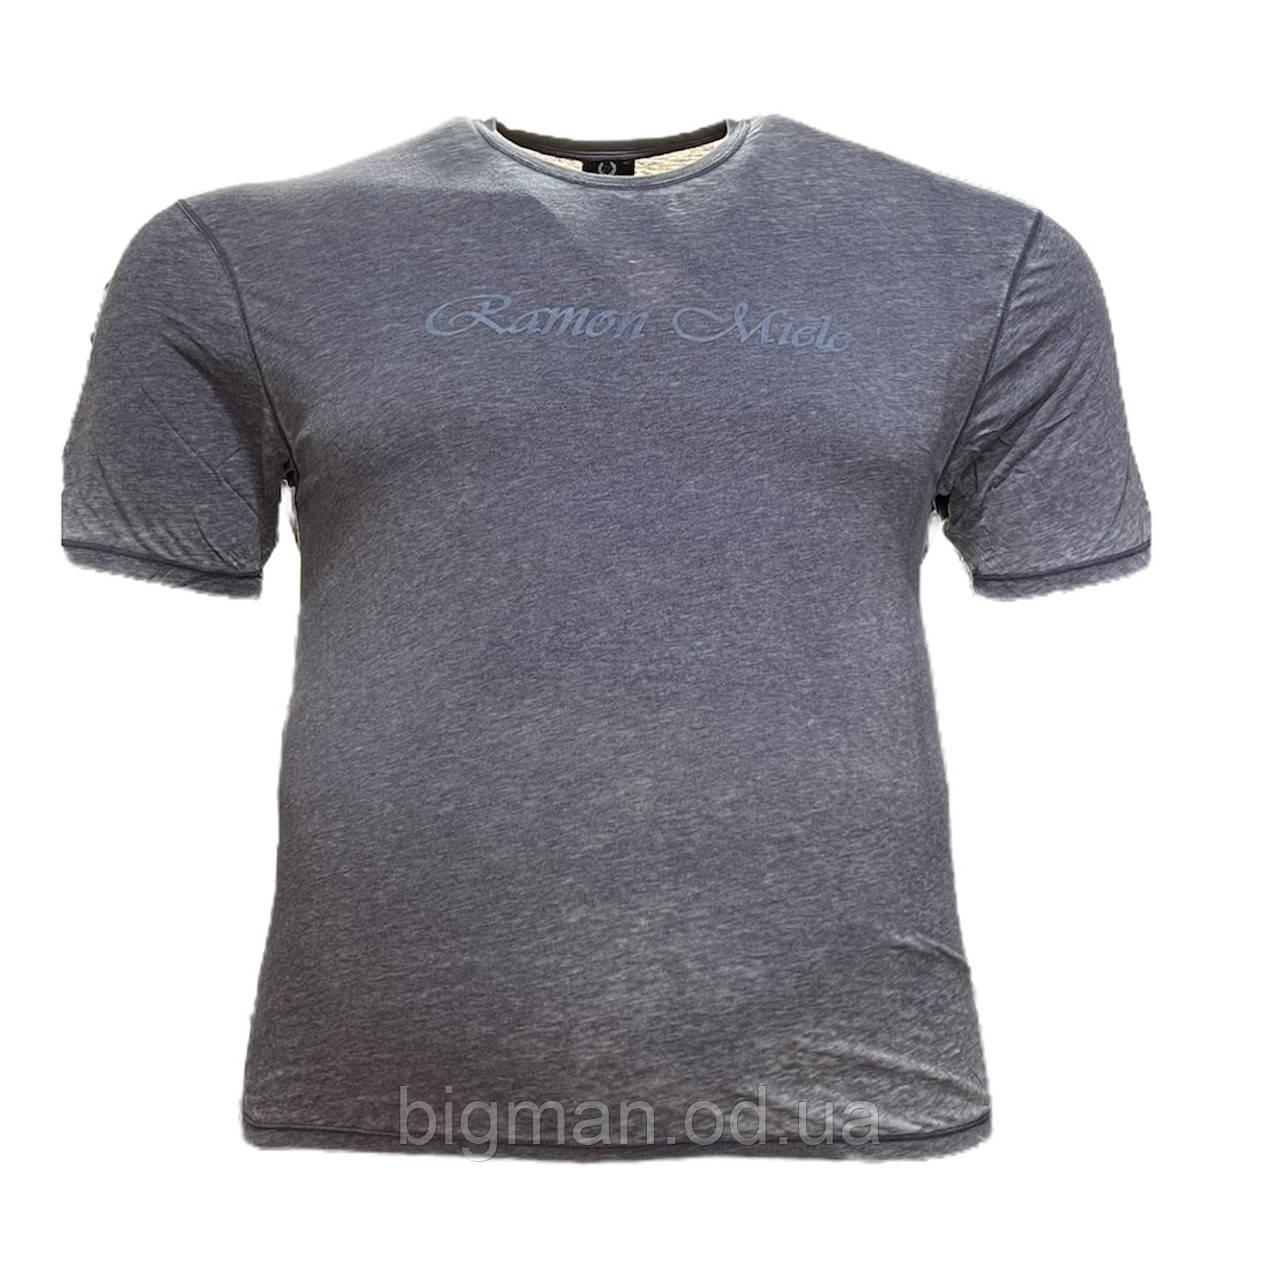 Мужская батальная футболка Miele 12117 2XL 3XL 4XL 5XL 6XL серая большие размеры Турция